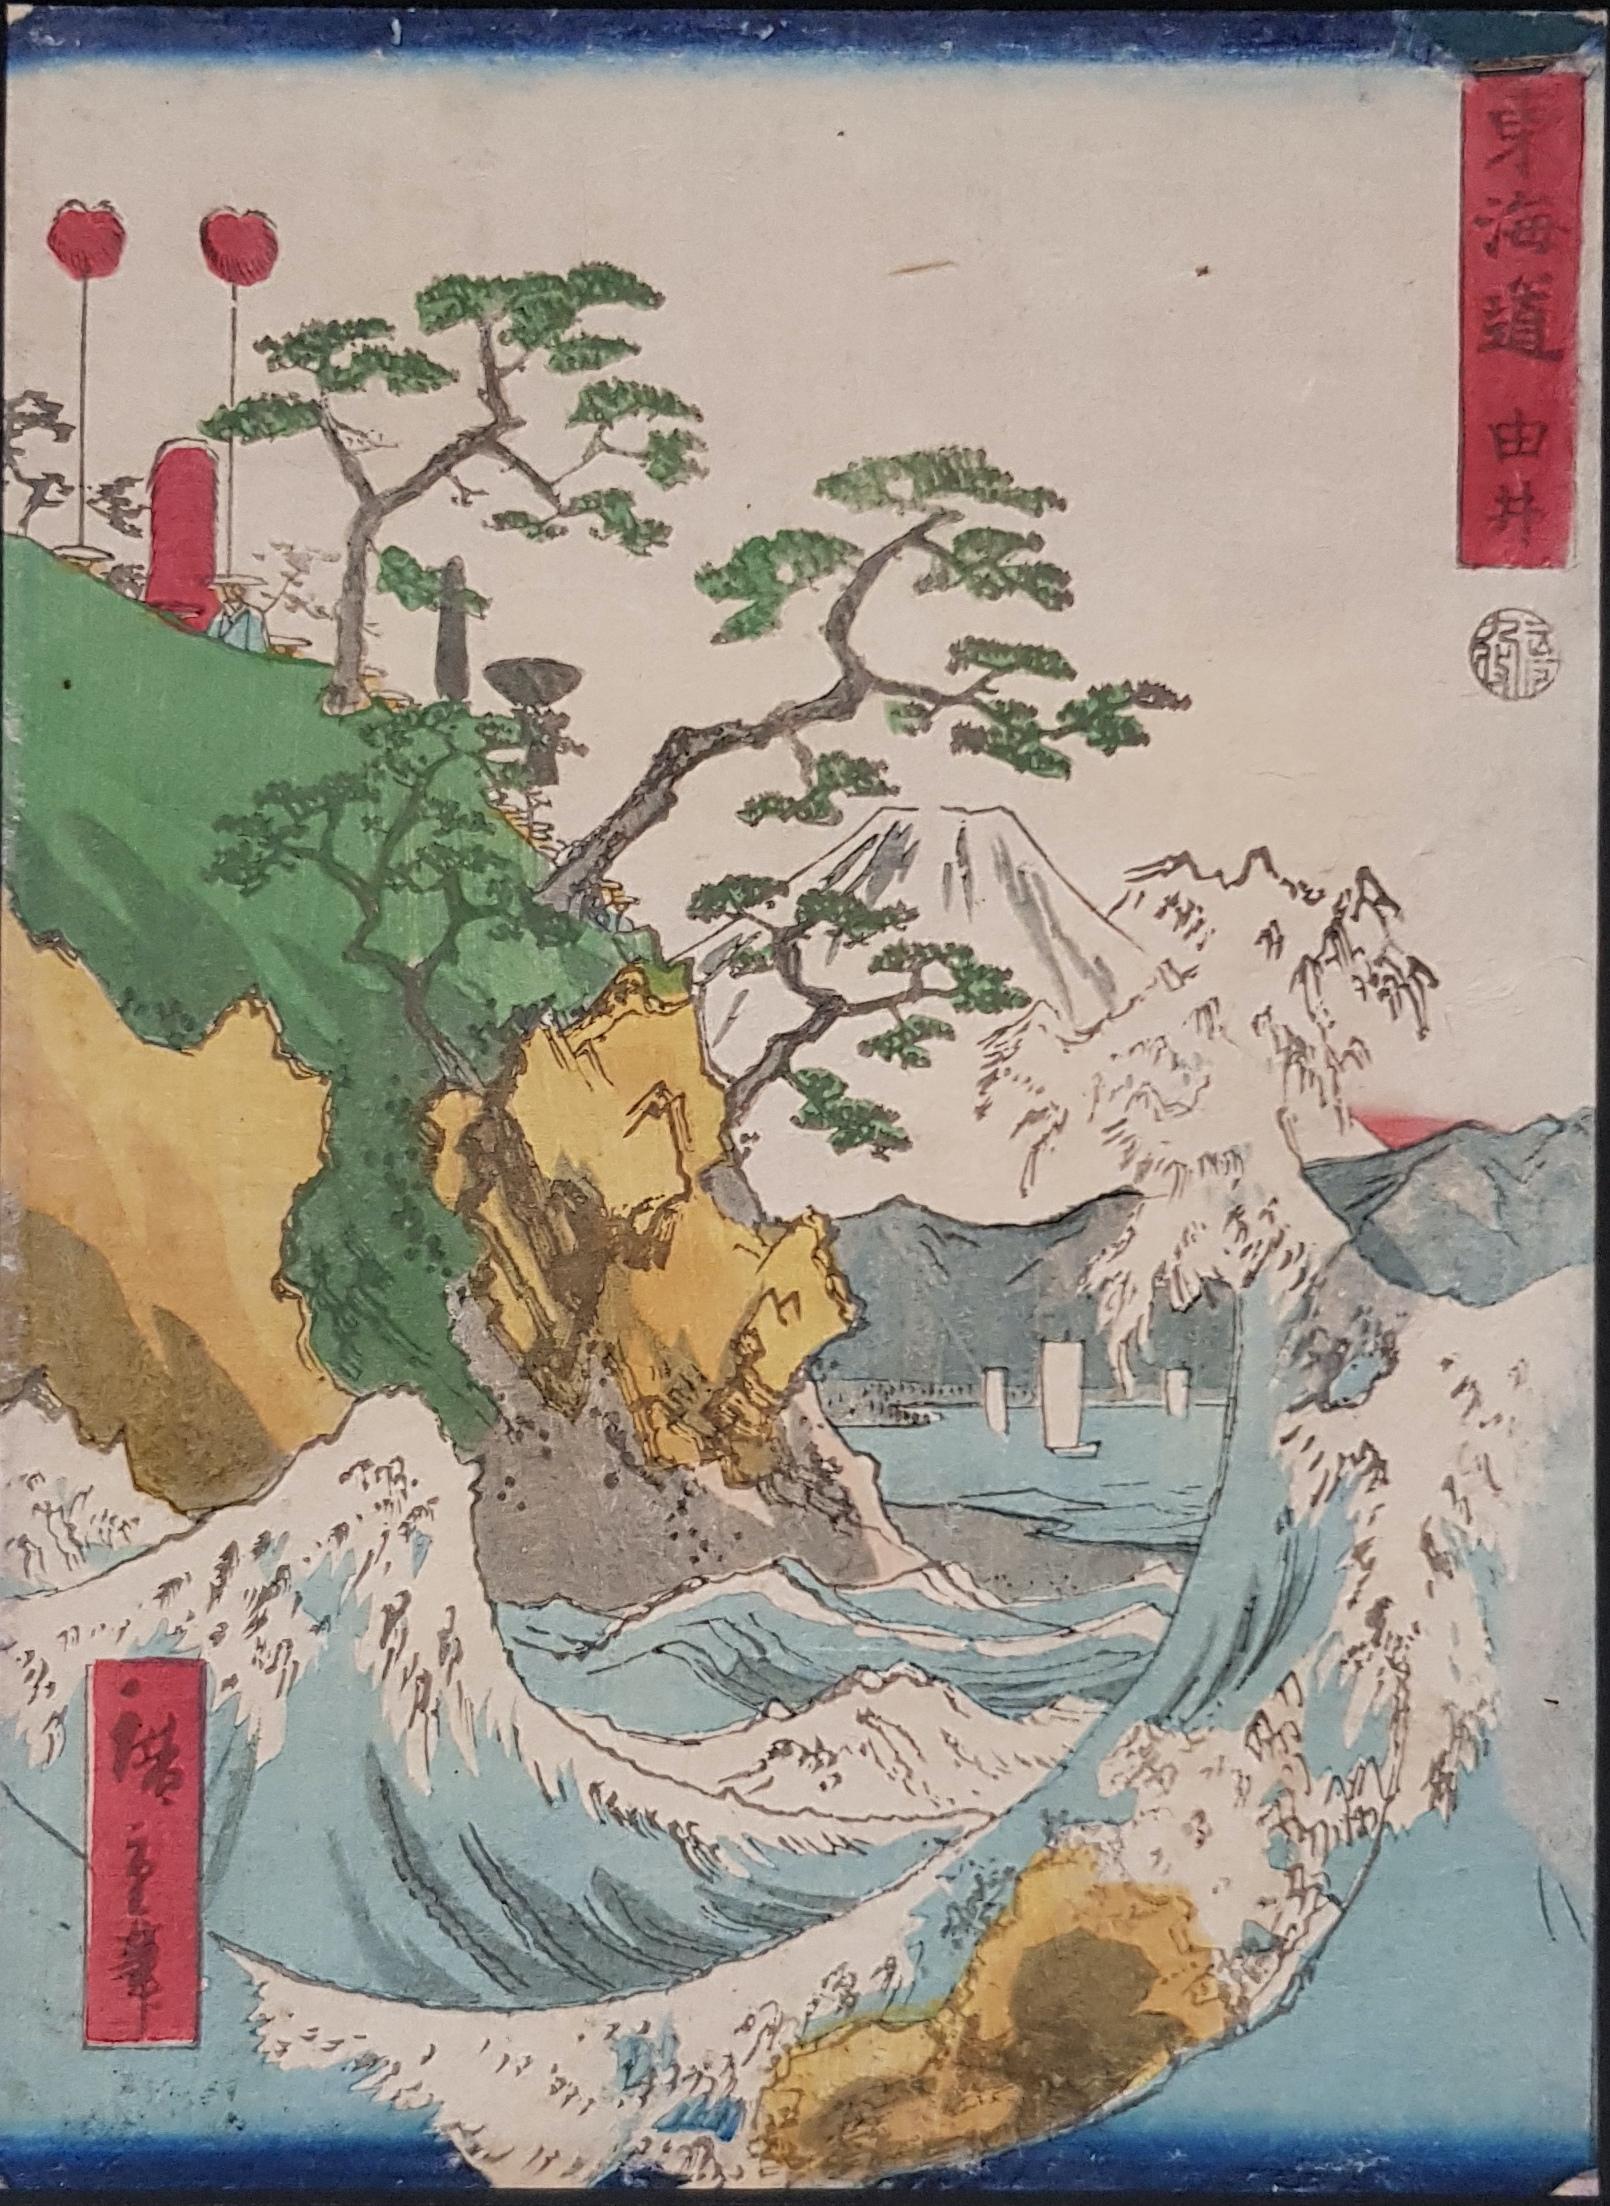 Japon - Estampe originale Hiroshige II - Tokaïdo - Yui - Edo 1863 Image